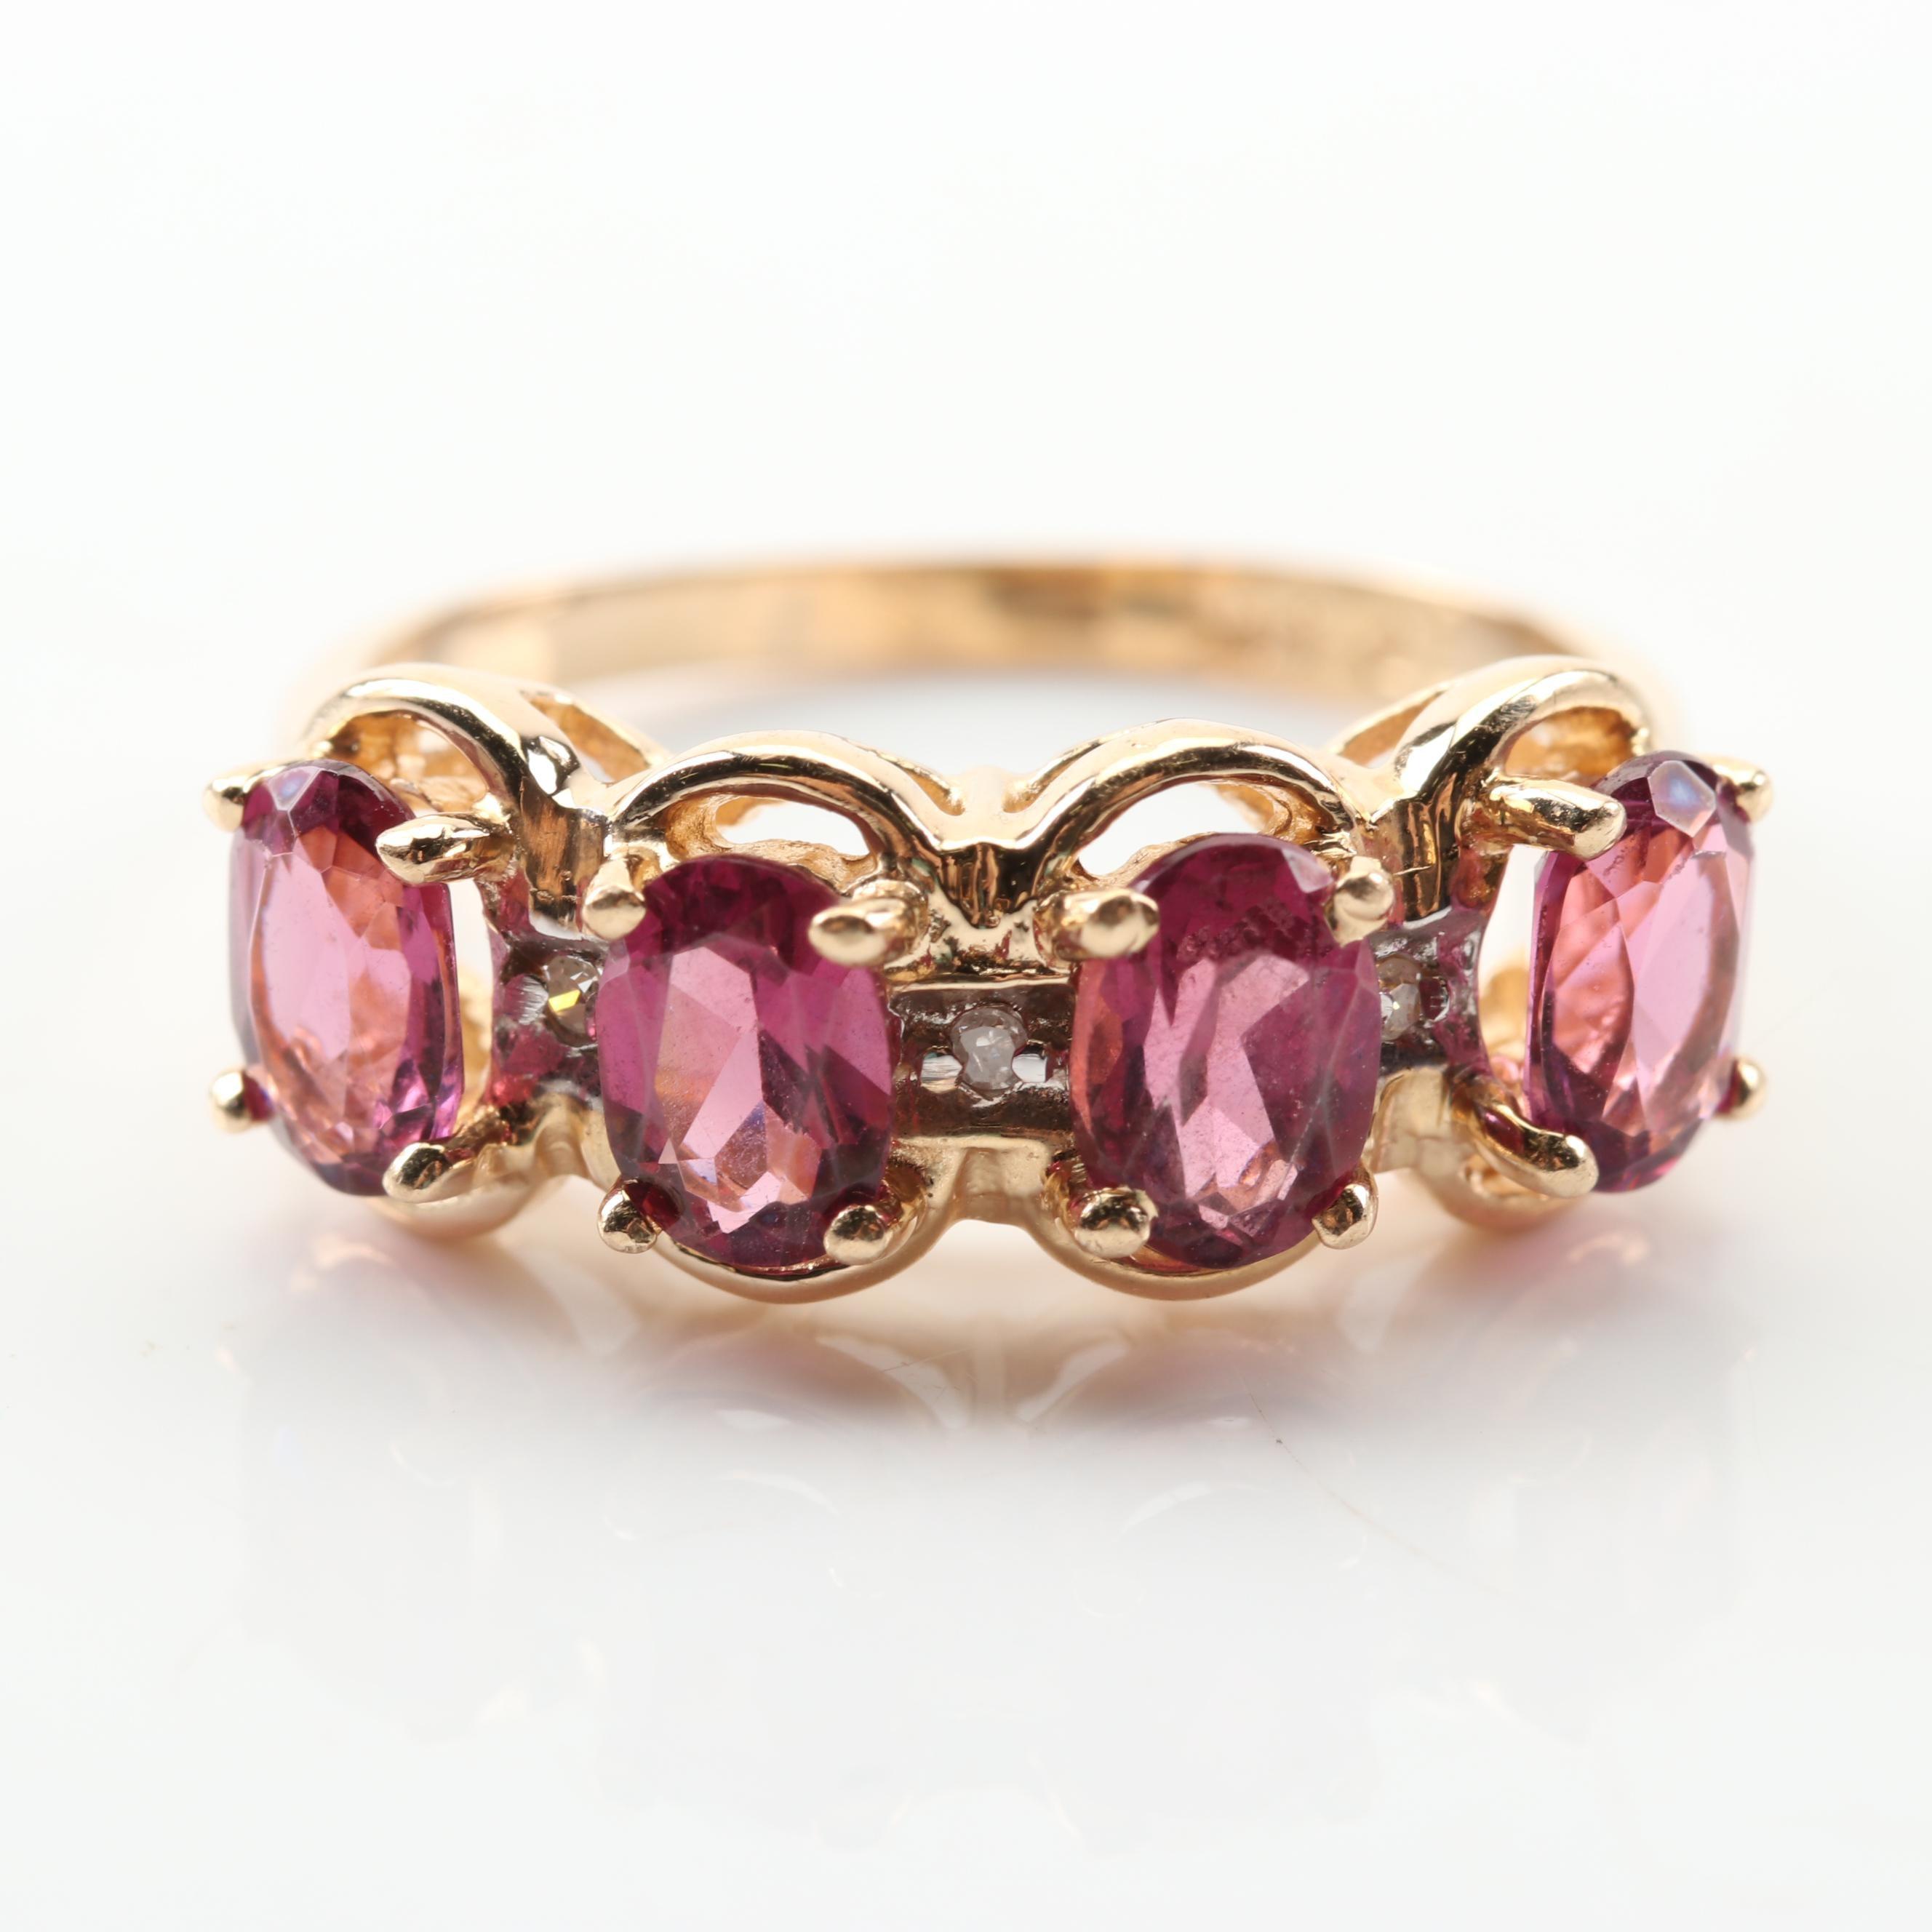 14K Yellow Gold 2.36 CTW Garnet and Diamond Ring